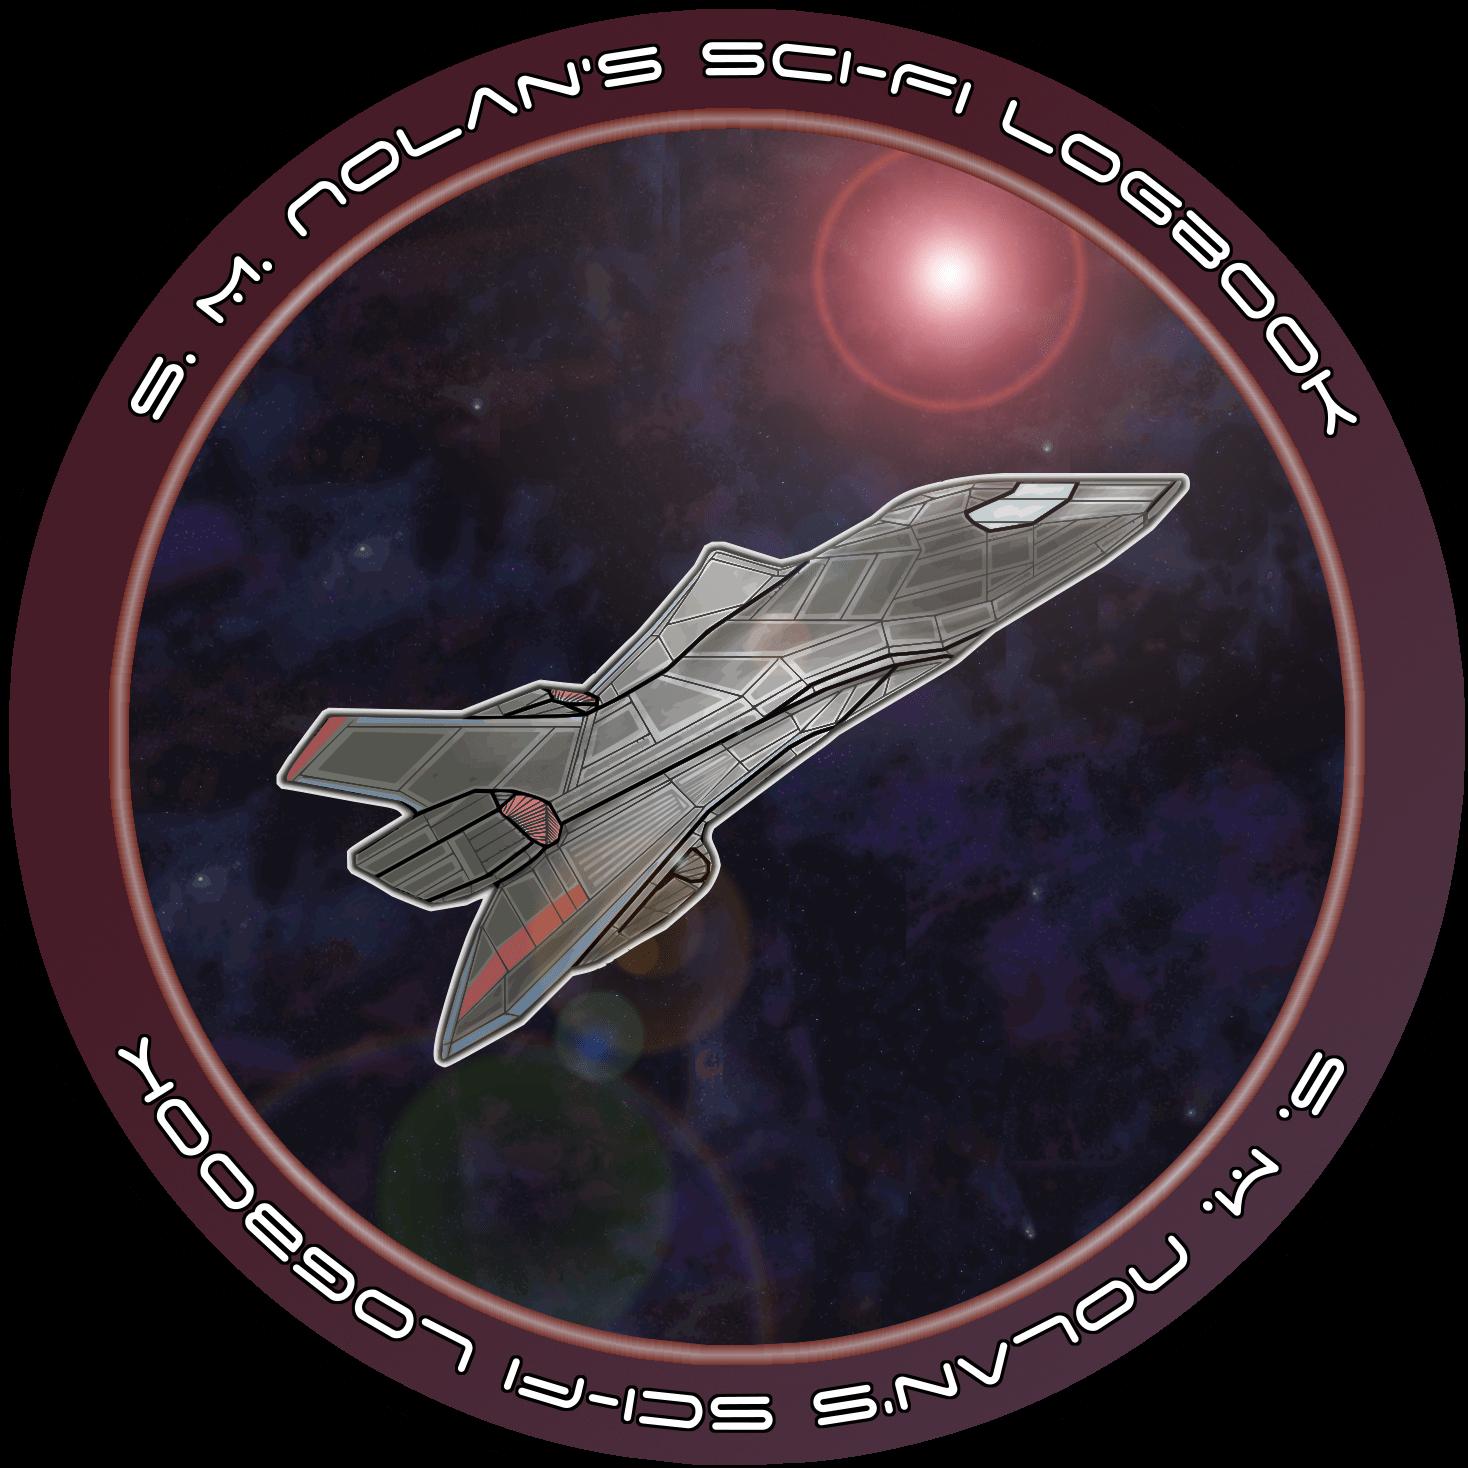 S. M. Nolan's Sci-Fi Logbook